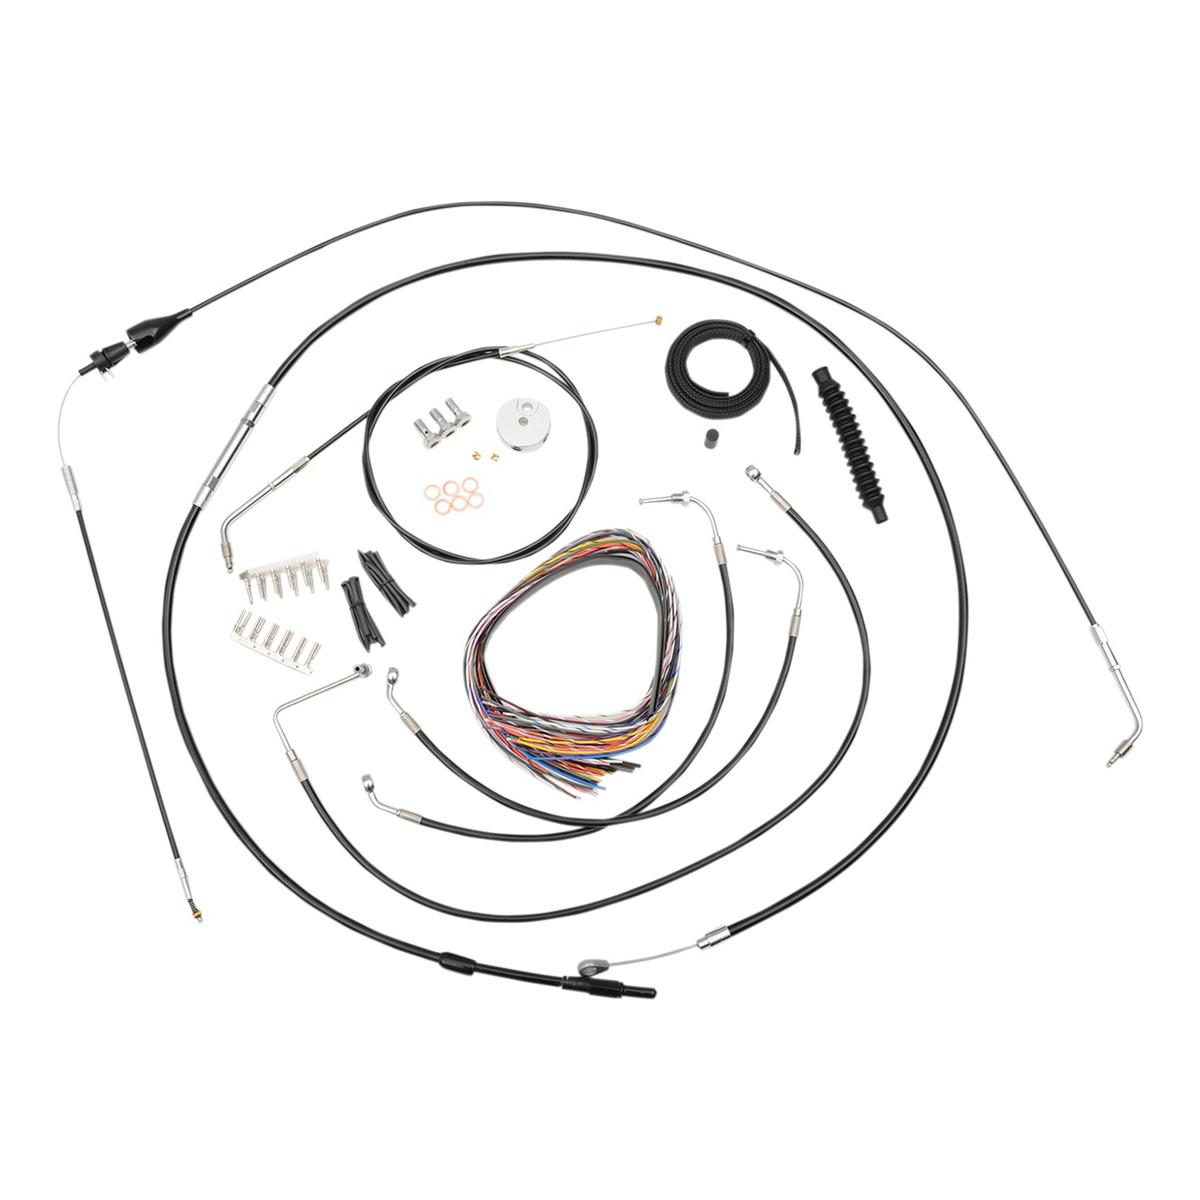 LA Choppers Black Complete Cable/Line/Wiring Handlebar Kit for Mini Ape Bars